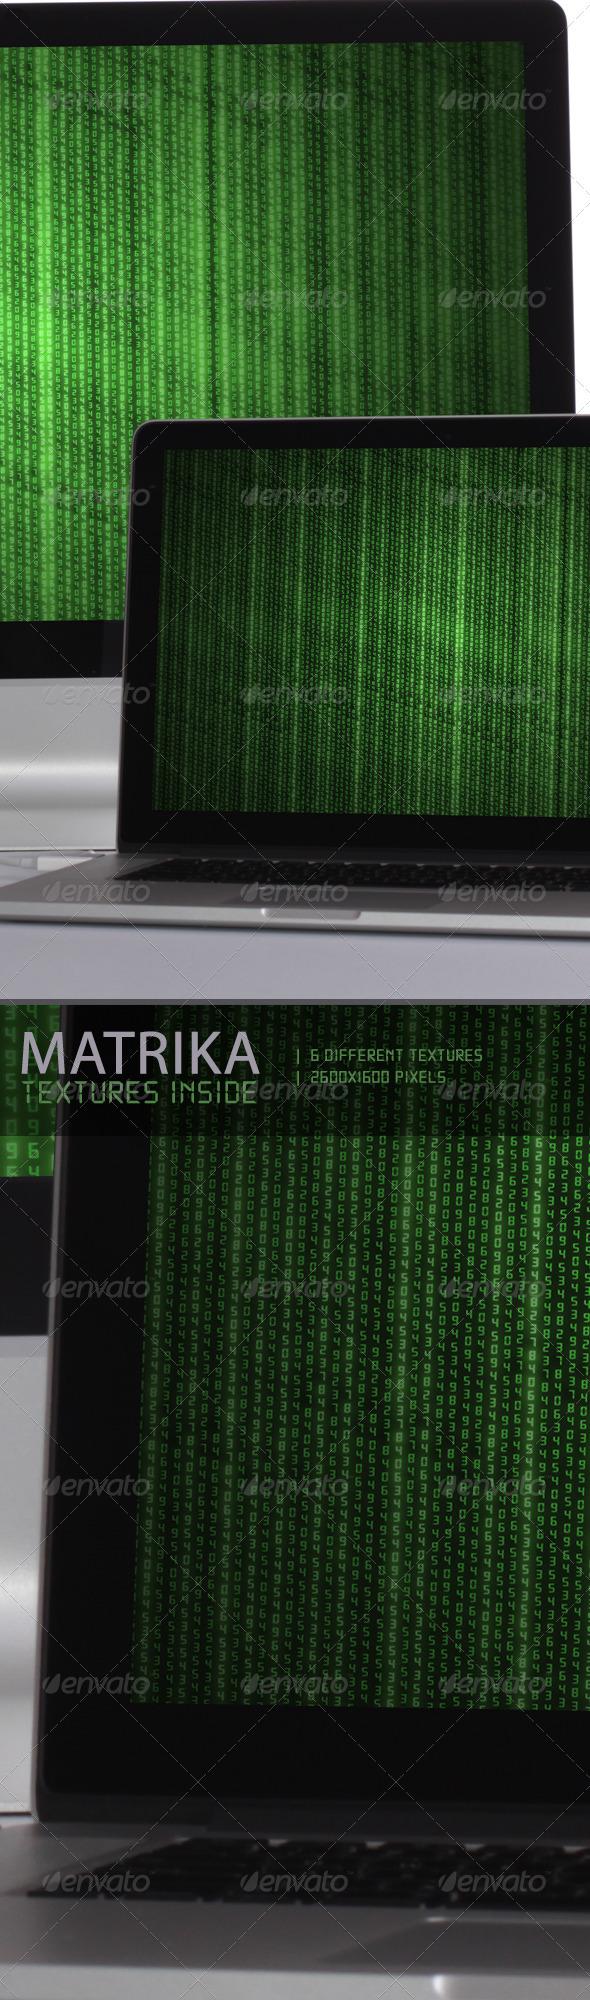 Matrika Textures - Abstract Backgrounds